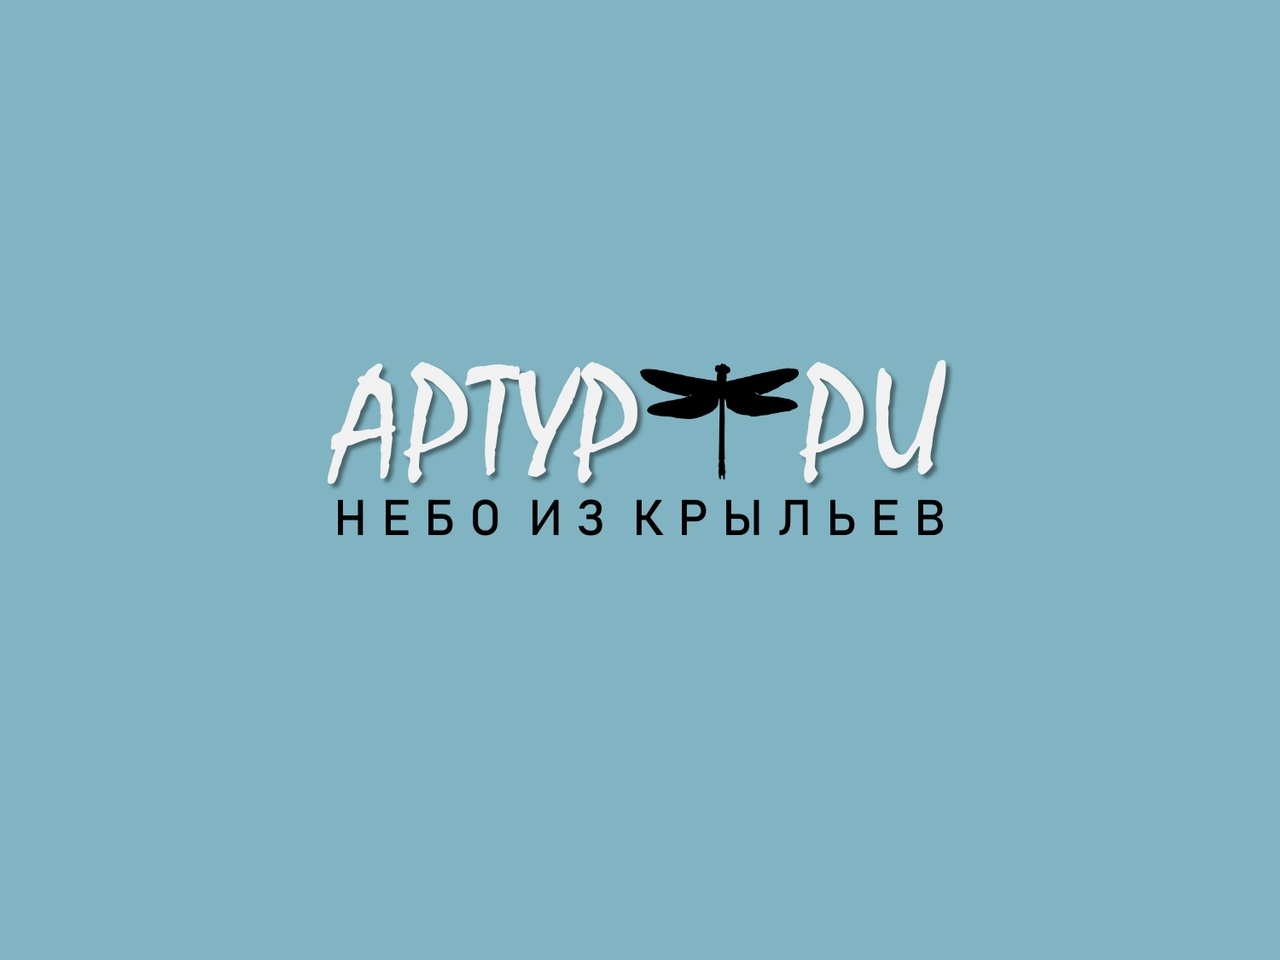 Афиша Красноярск АРТУР РИ / 13.10 / Old Future